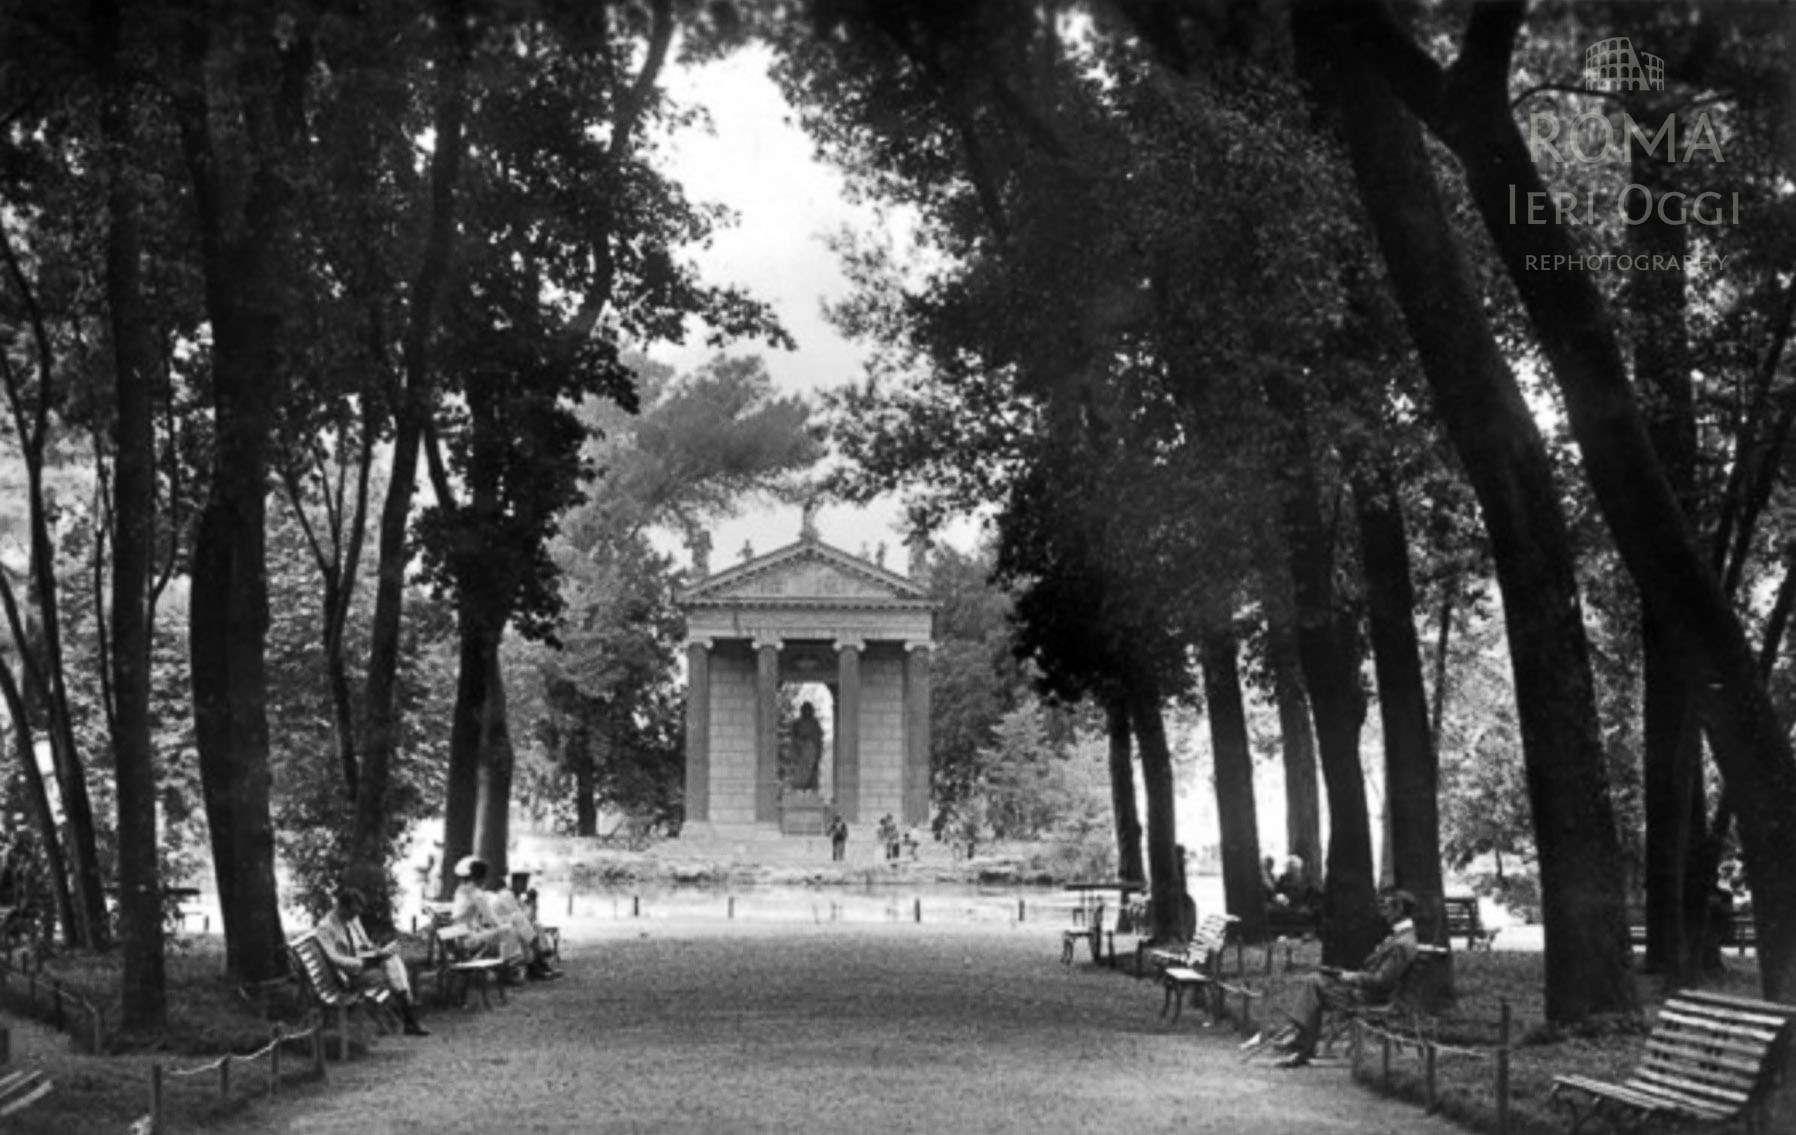 Villa Borghese - Laghetto